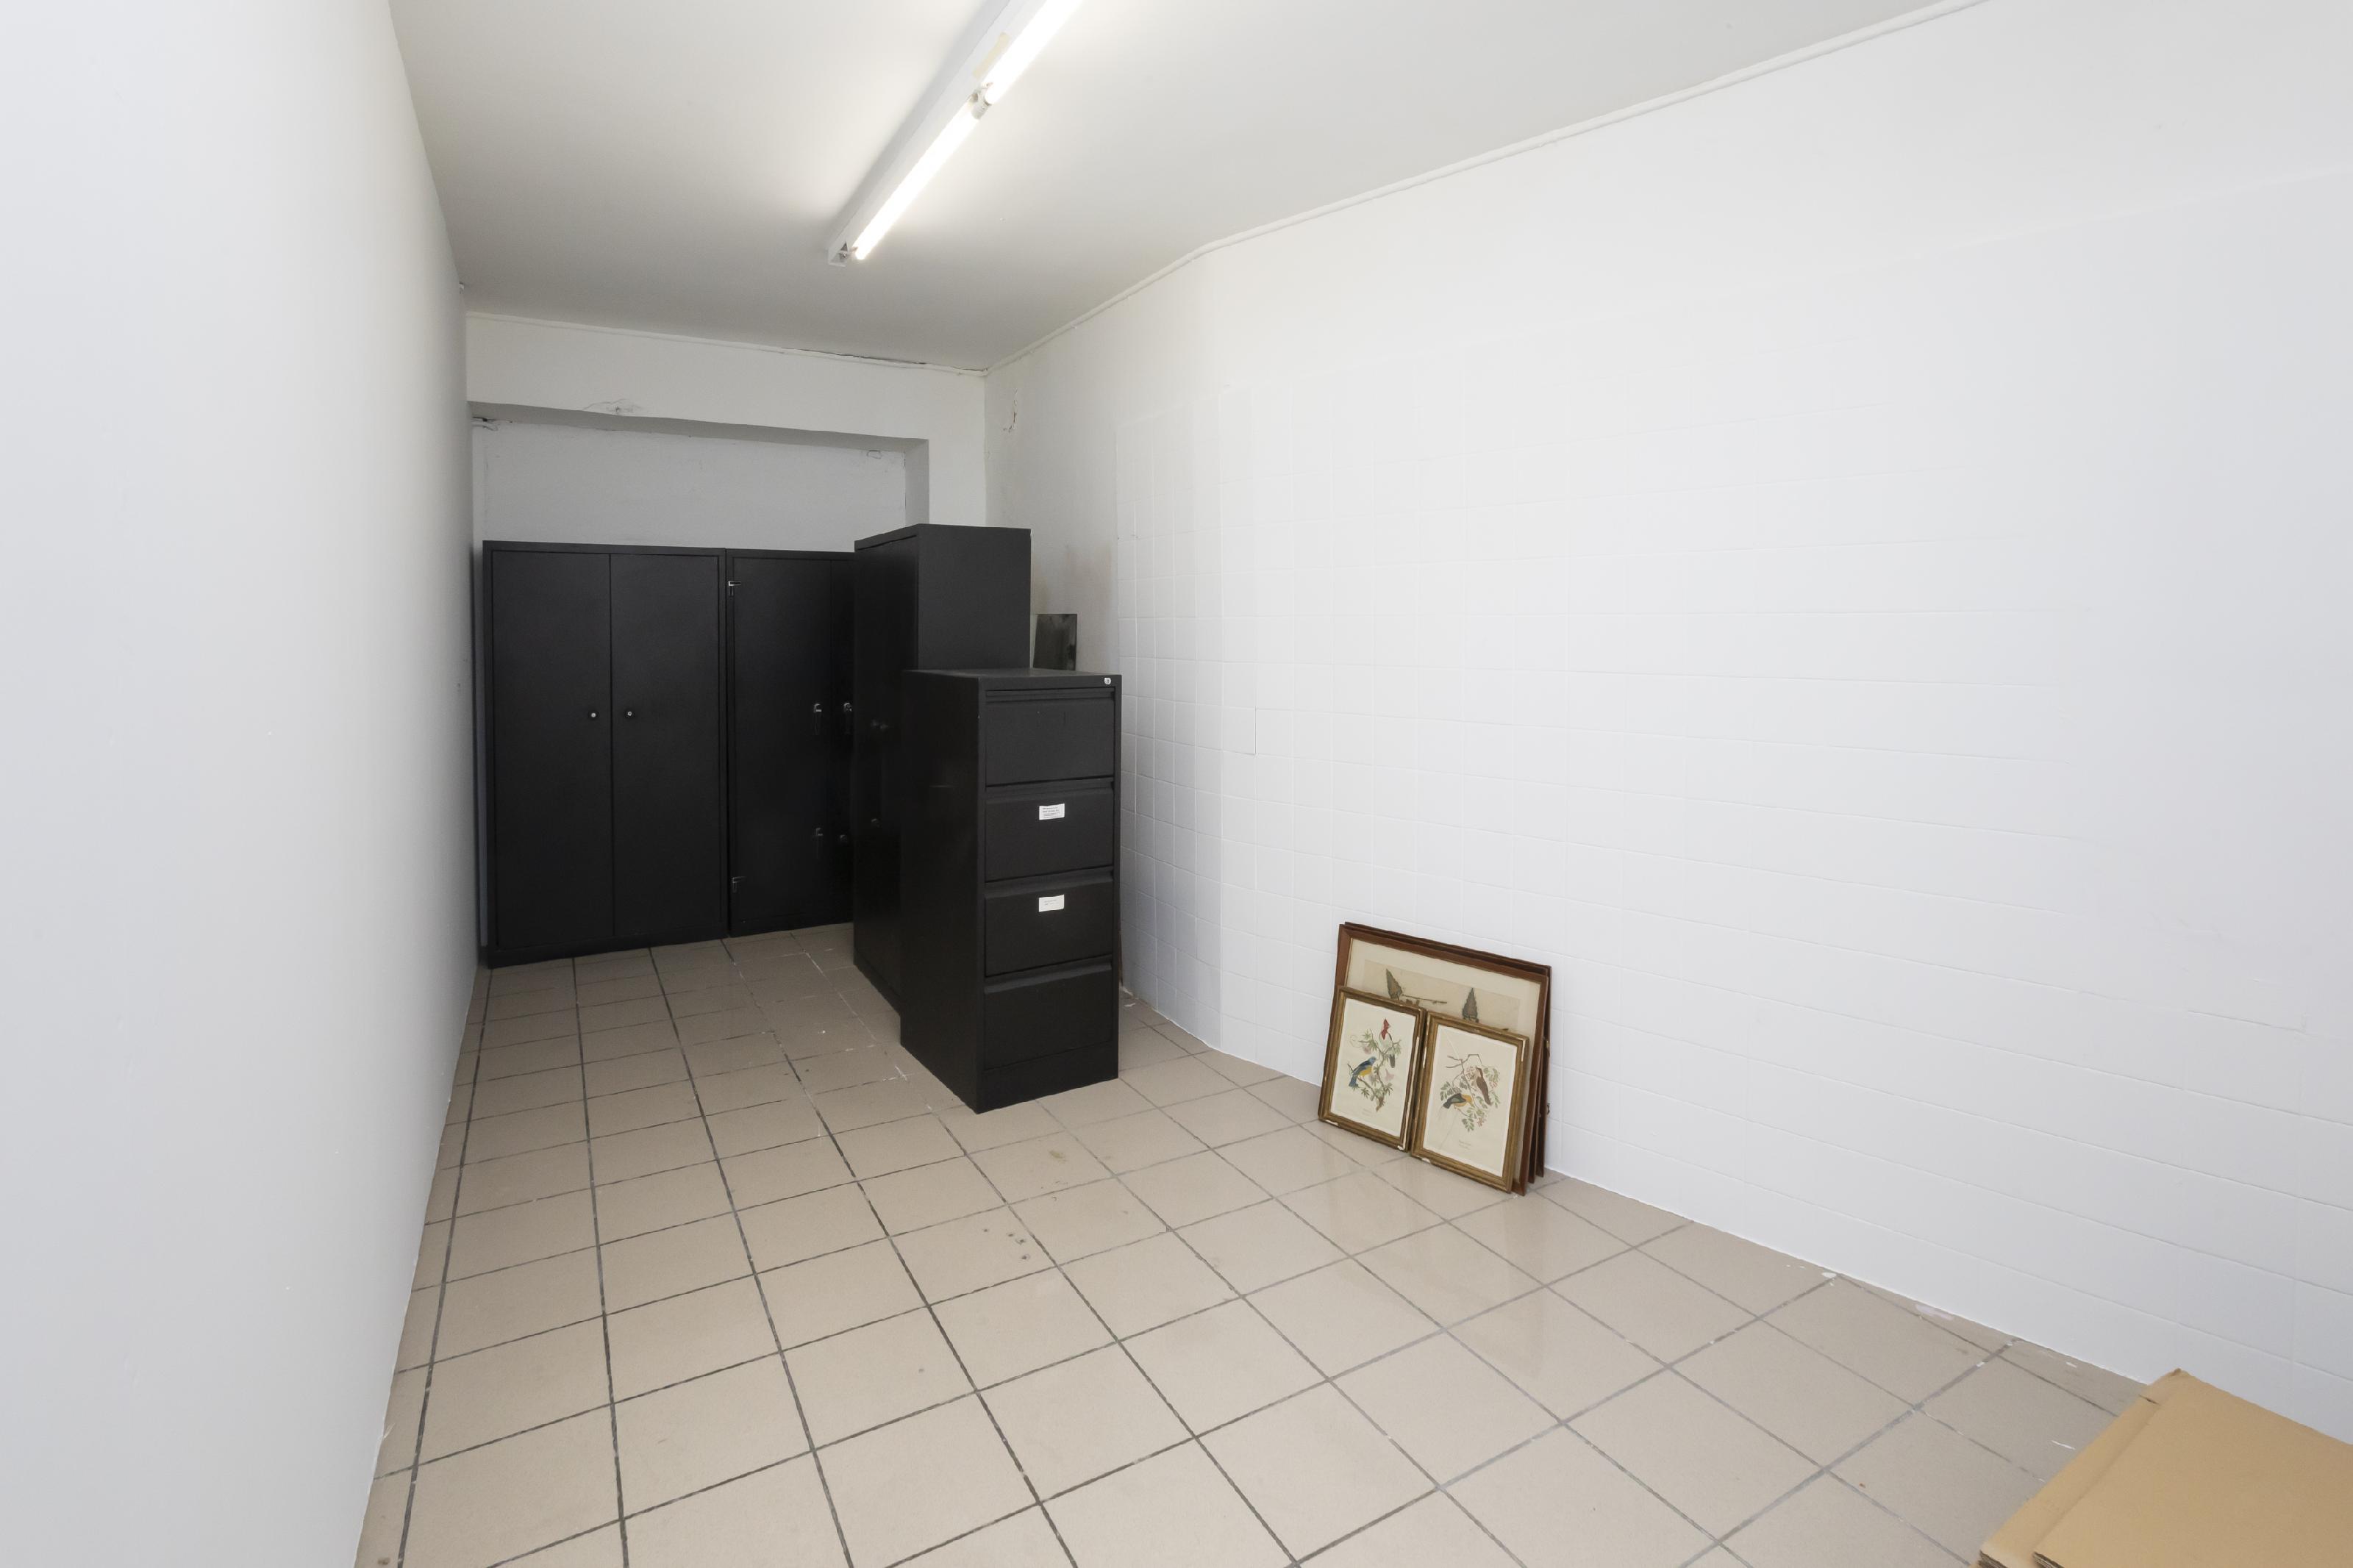 249493 Commercial premises for sale in Sarrià-Sant Gervasi, Sant Gervasi-Galvany 14